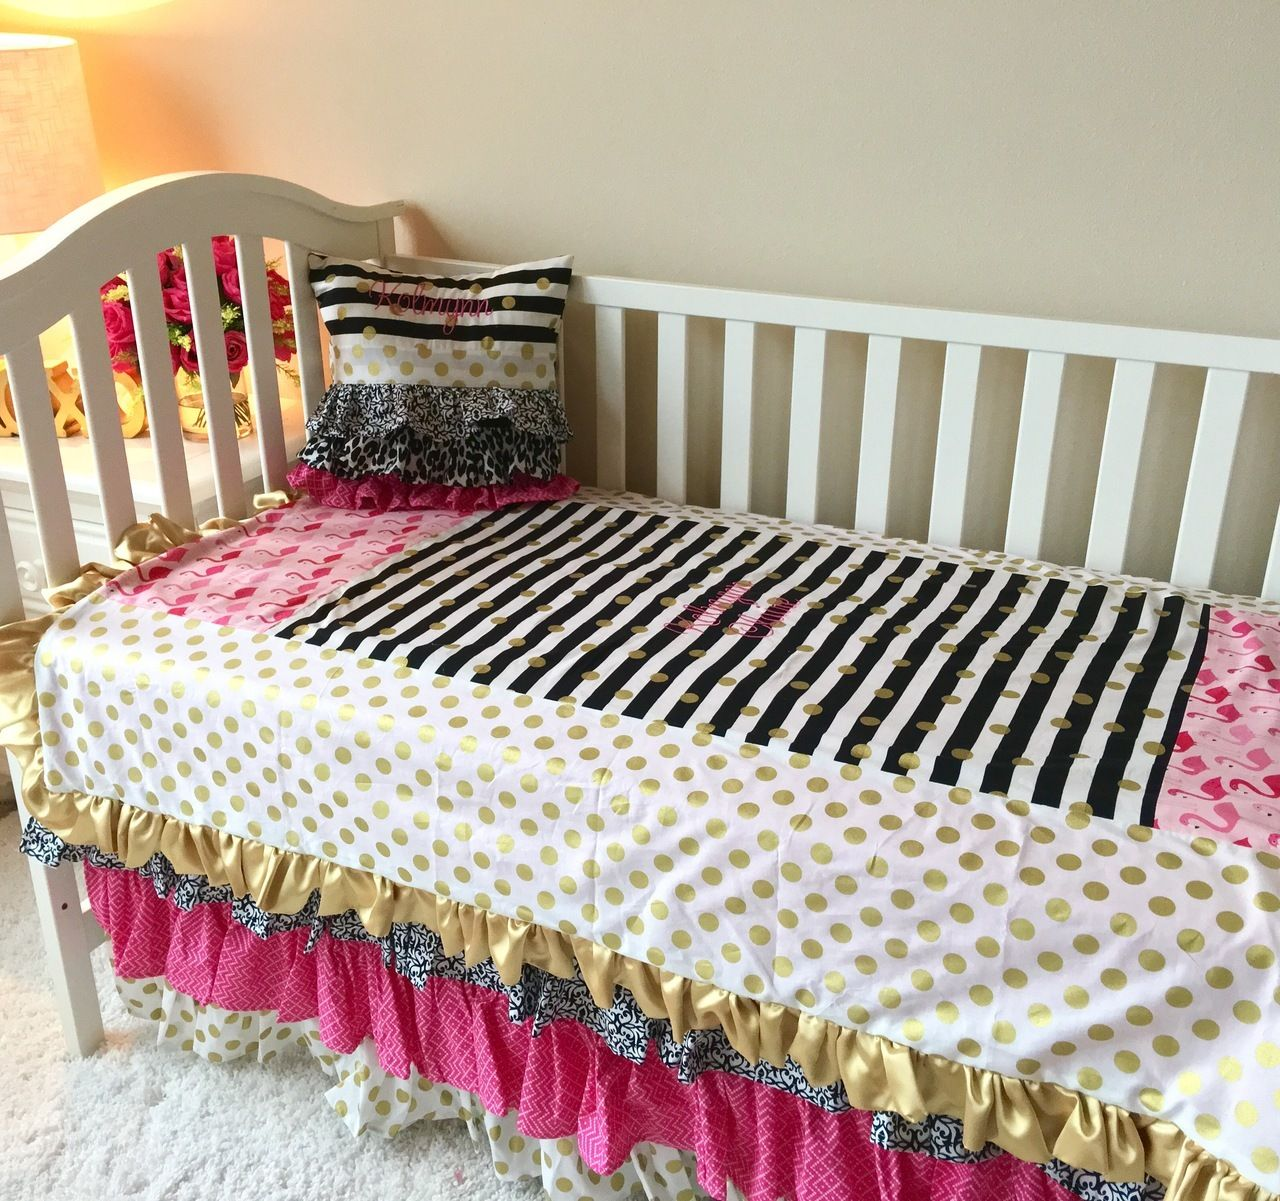 Gold Dot Toddler Bedding – Bedding Design Ideas